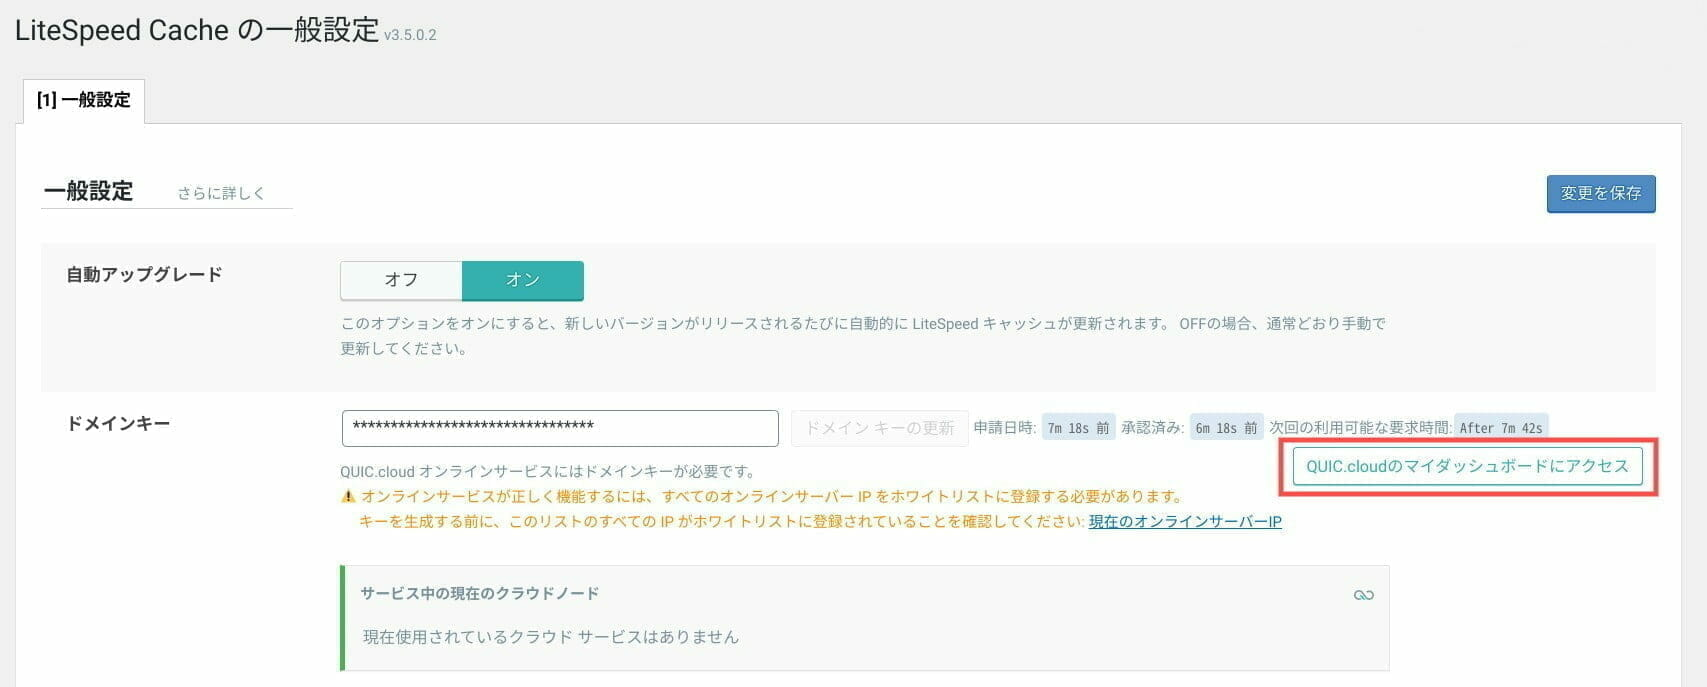 LiteSpeed Cache の一般設定:QUIC.cloud に接続